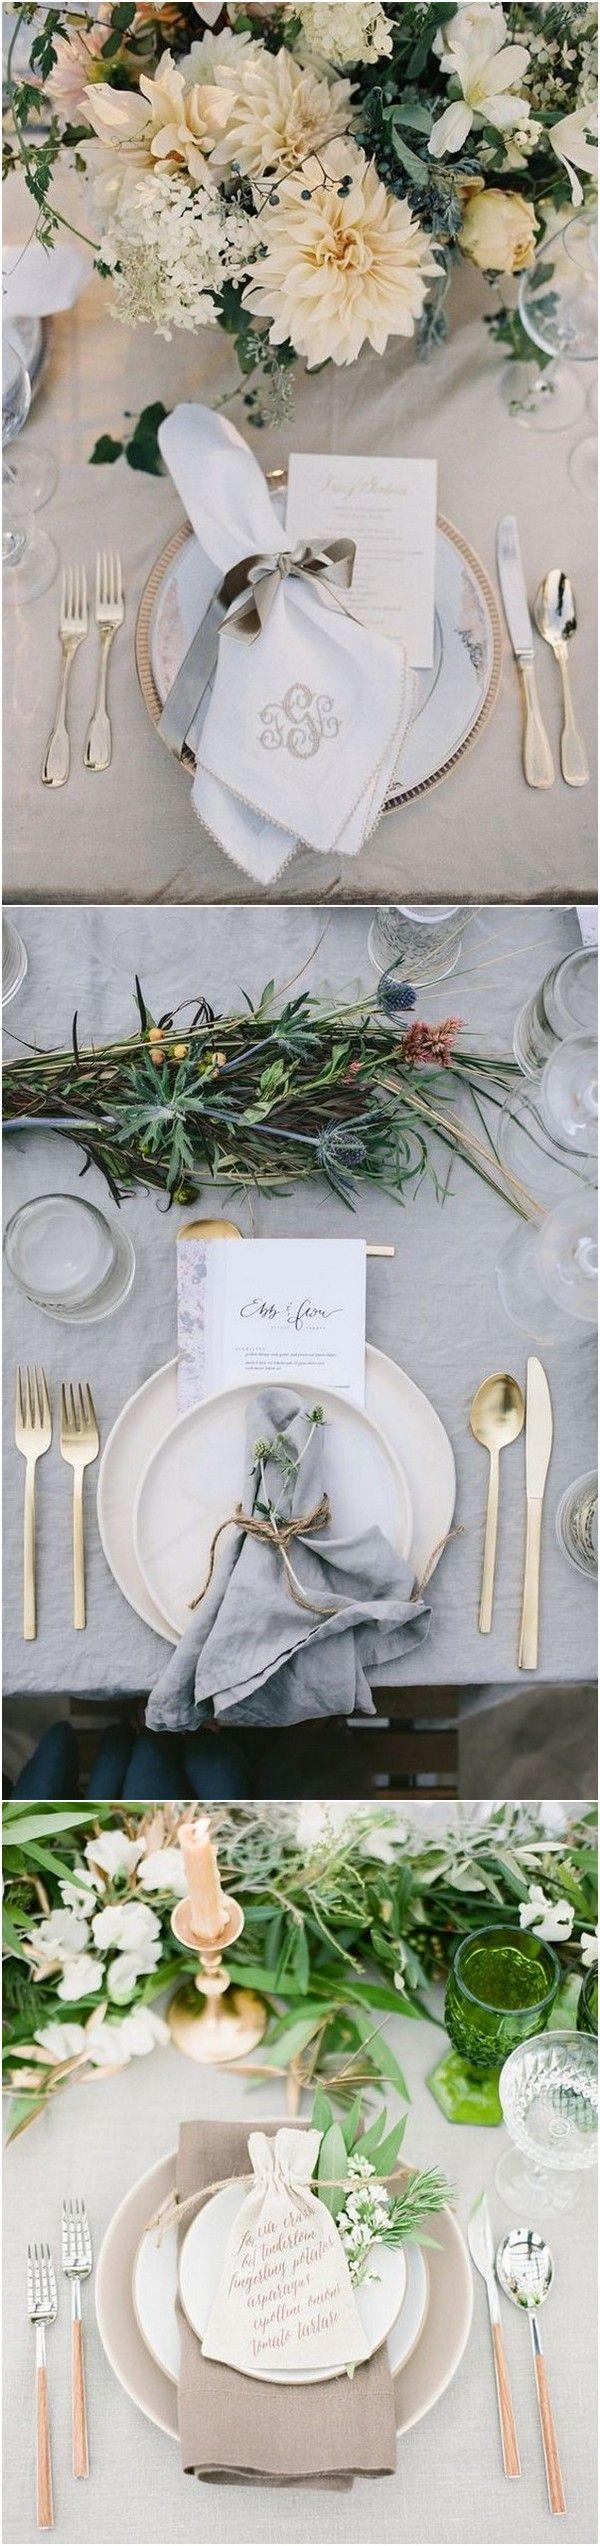 Wedding decorations 2019   Trending u  Elegant Neutral Color Wedding Ideas  Bridal